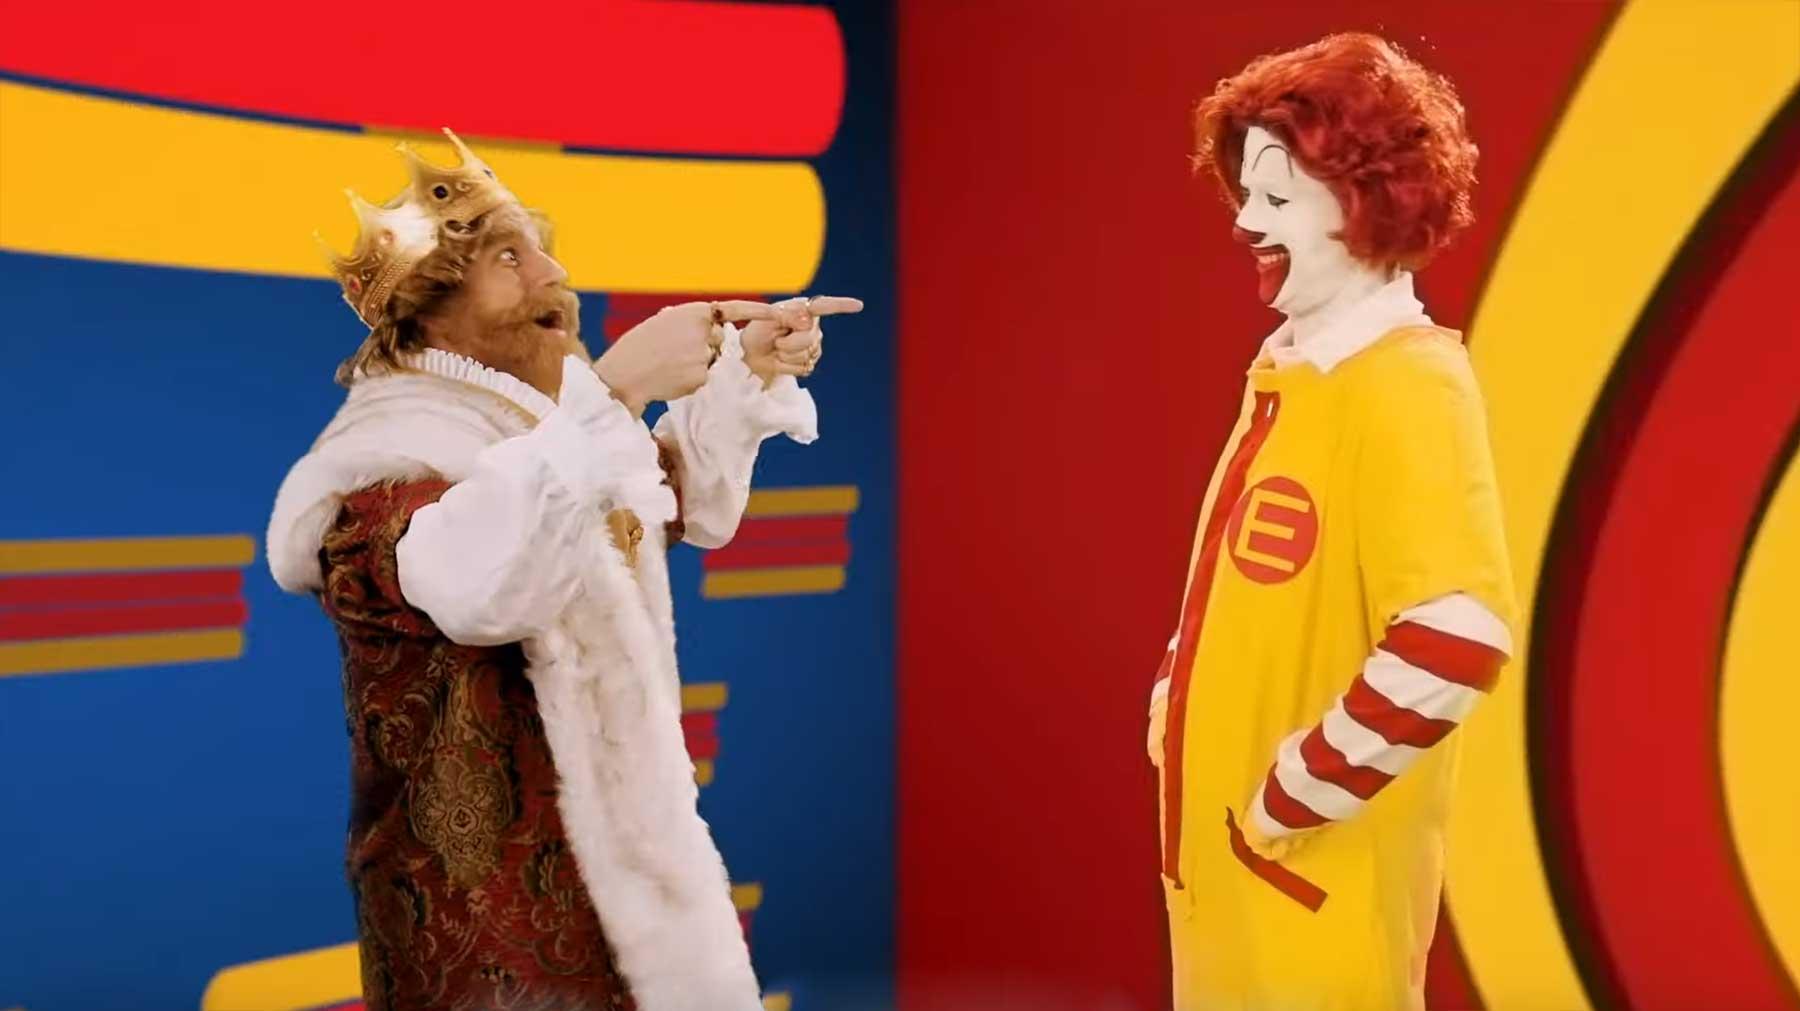 Epic Rap Battle: Ronald McDonald vs The Burger King burger-king-vs-ronald-mcdonald-rap-battle